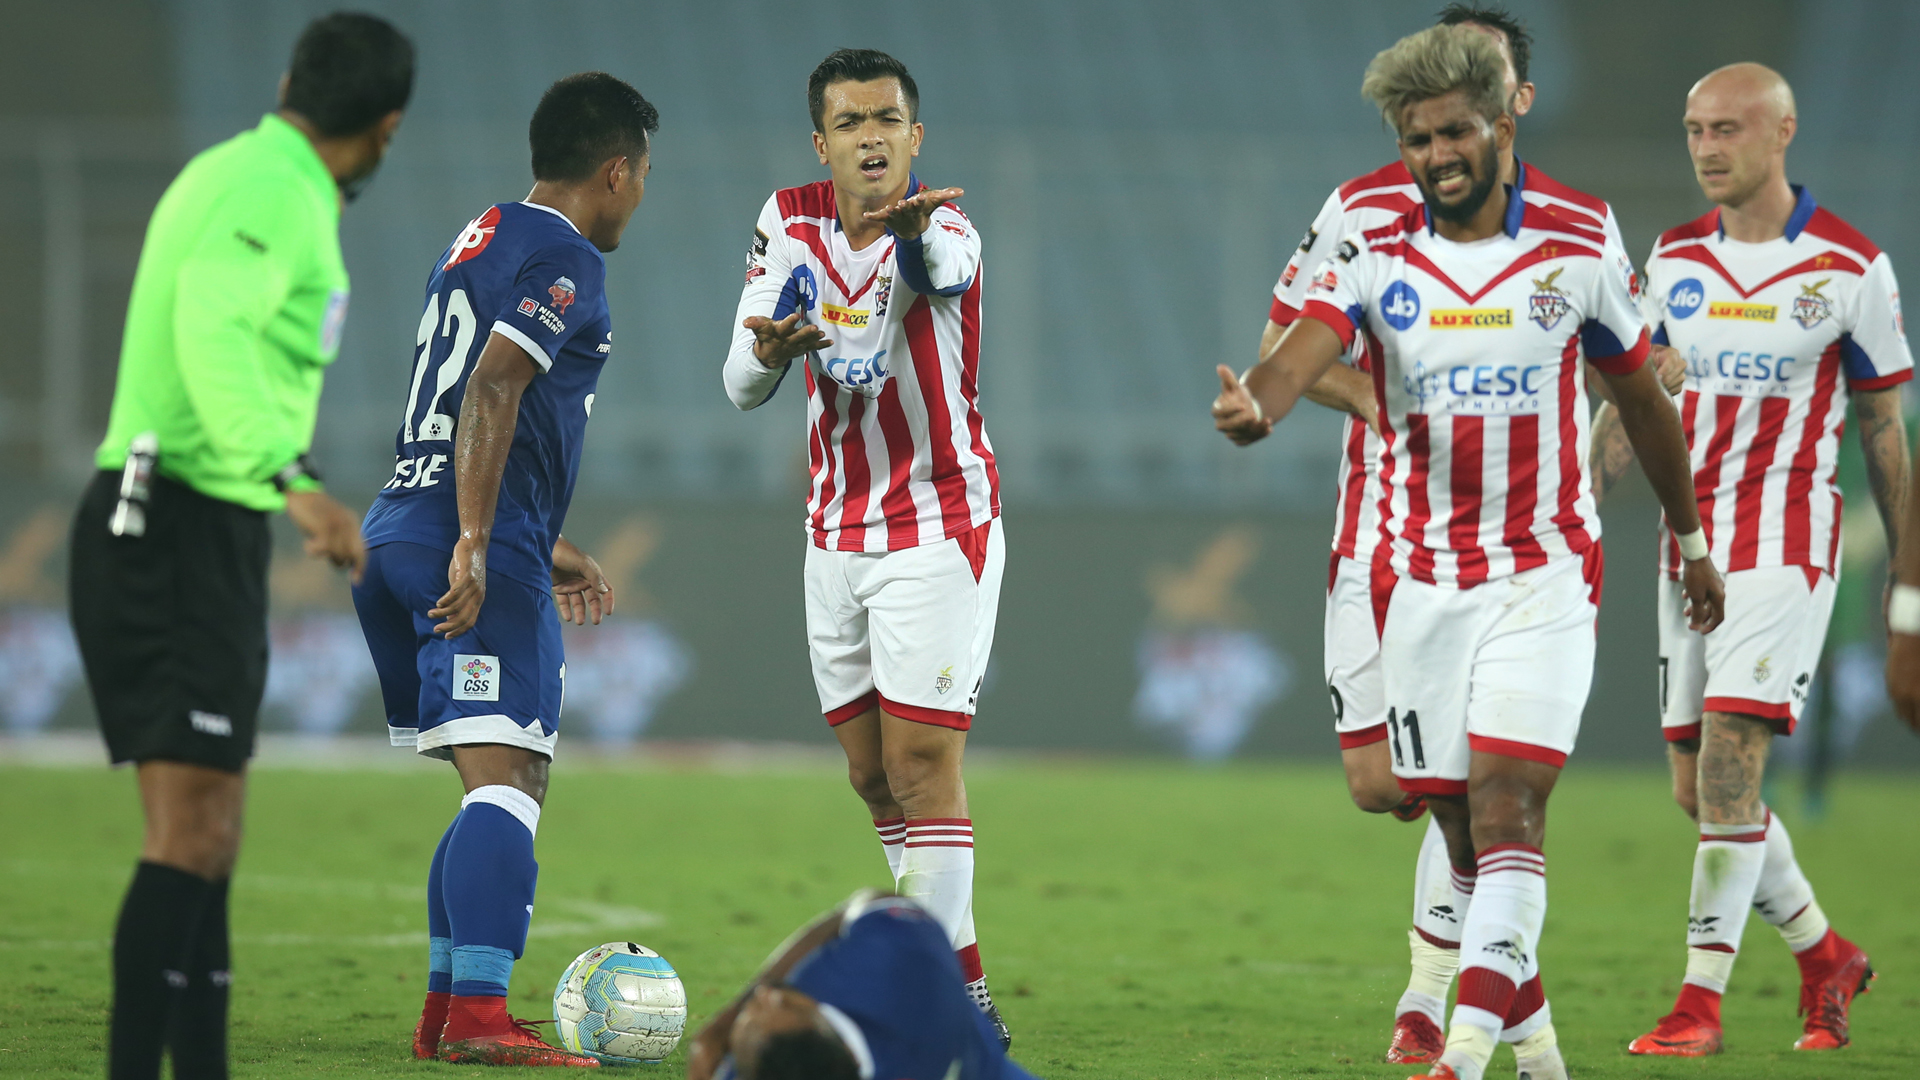 Rupert Nongrum ATK Chennaiyin FC ISL 4 2017/2018